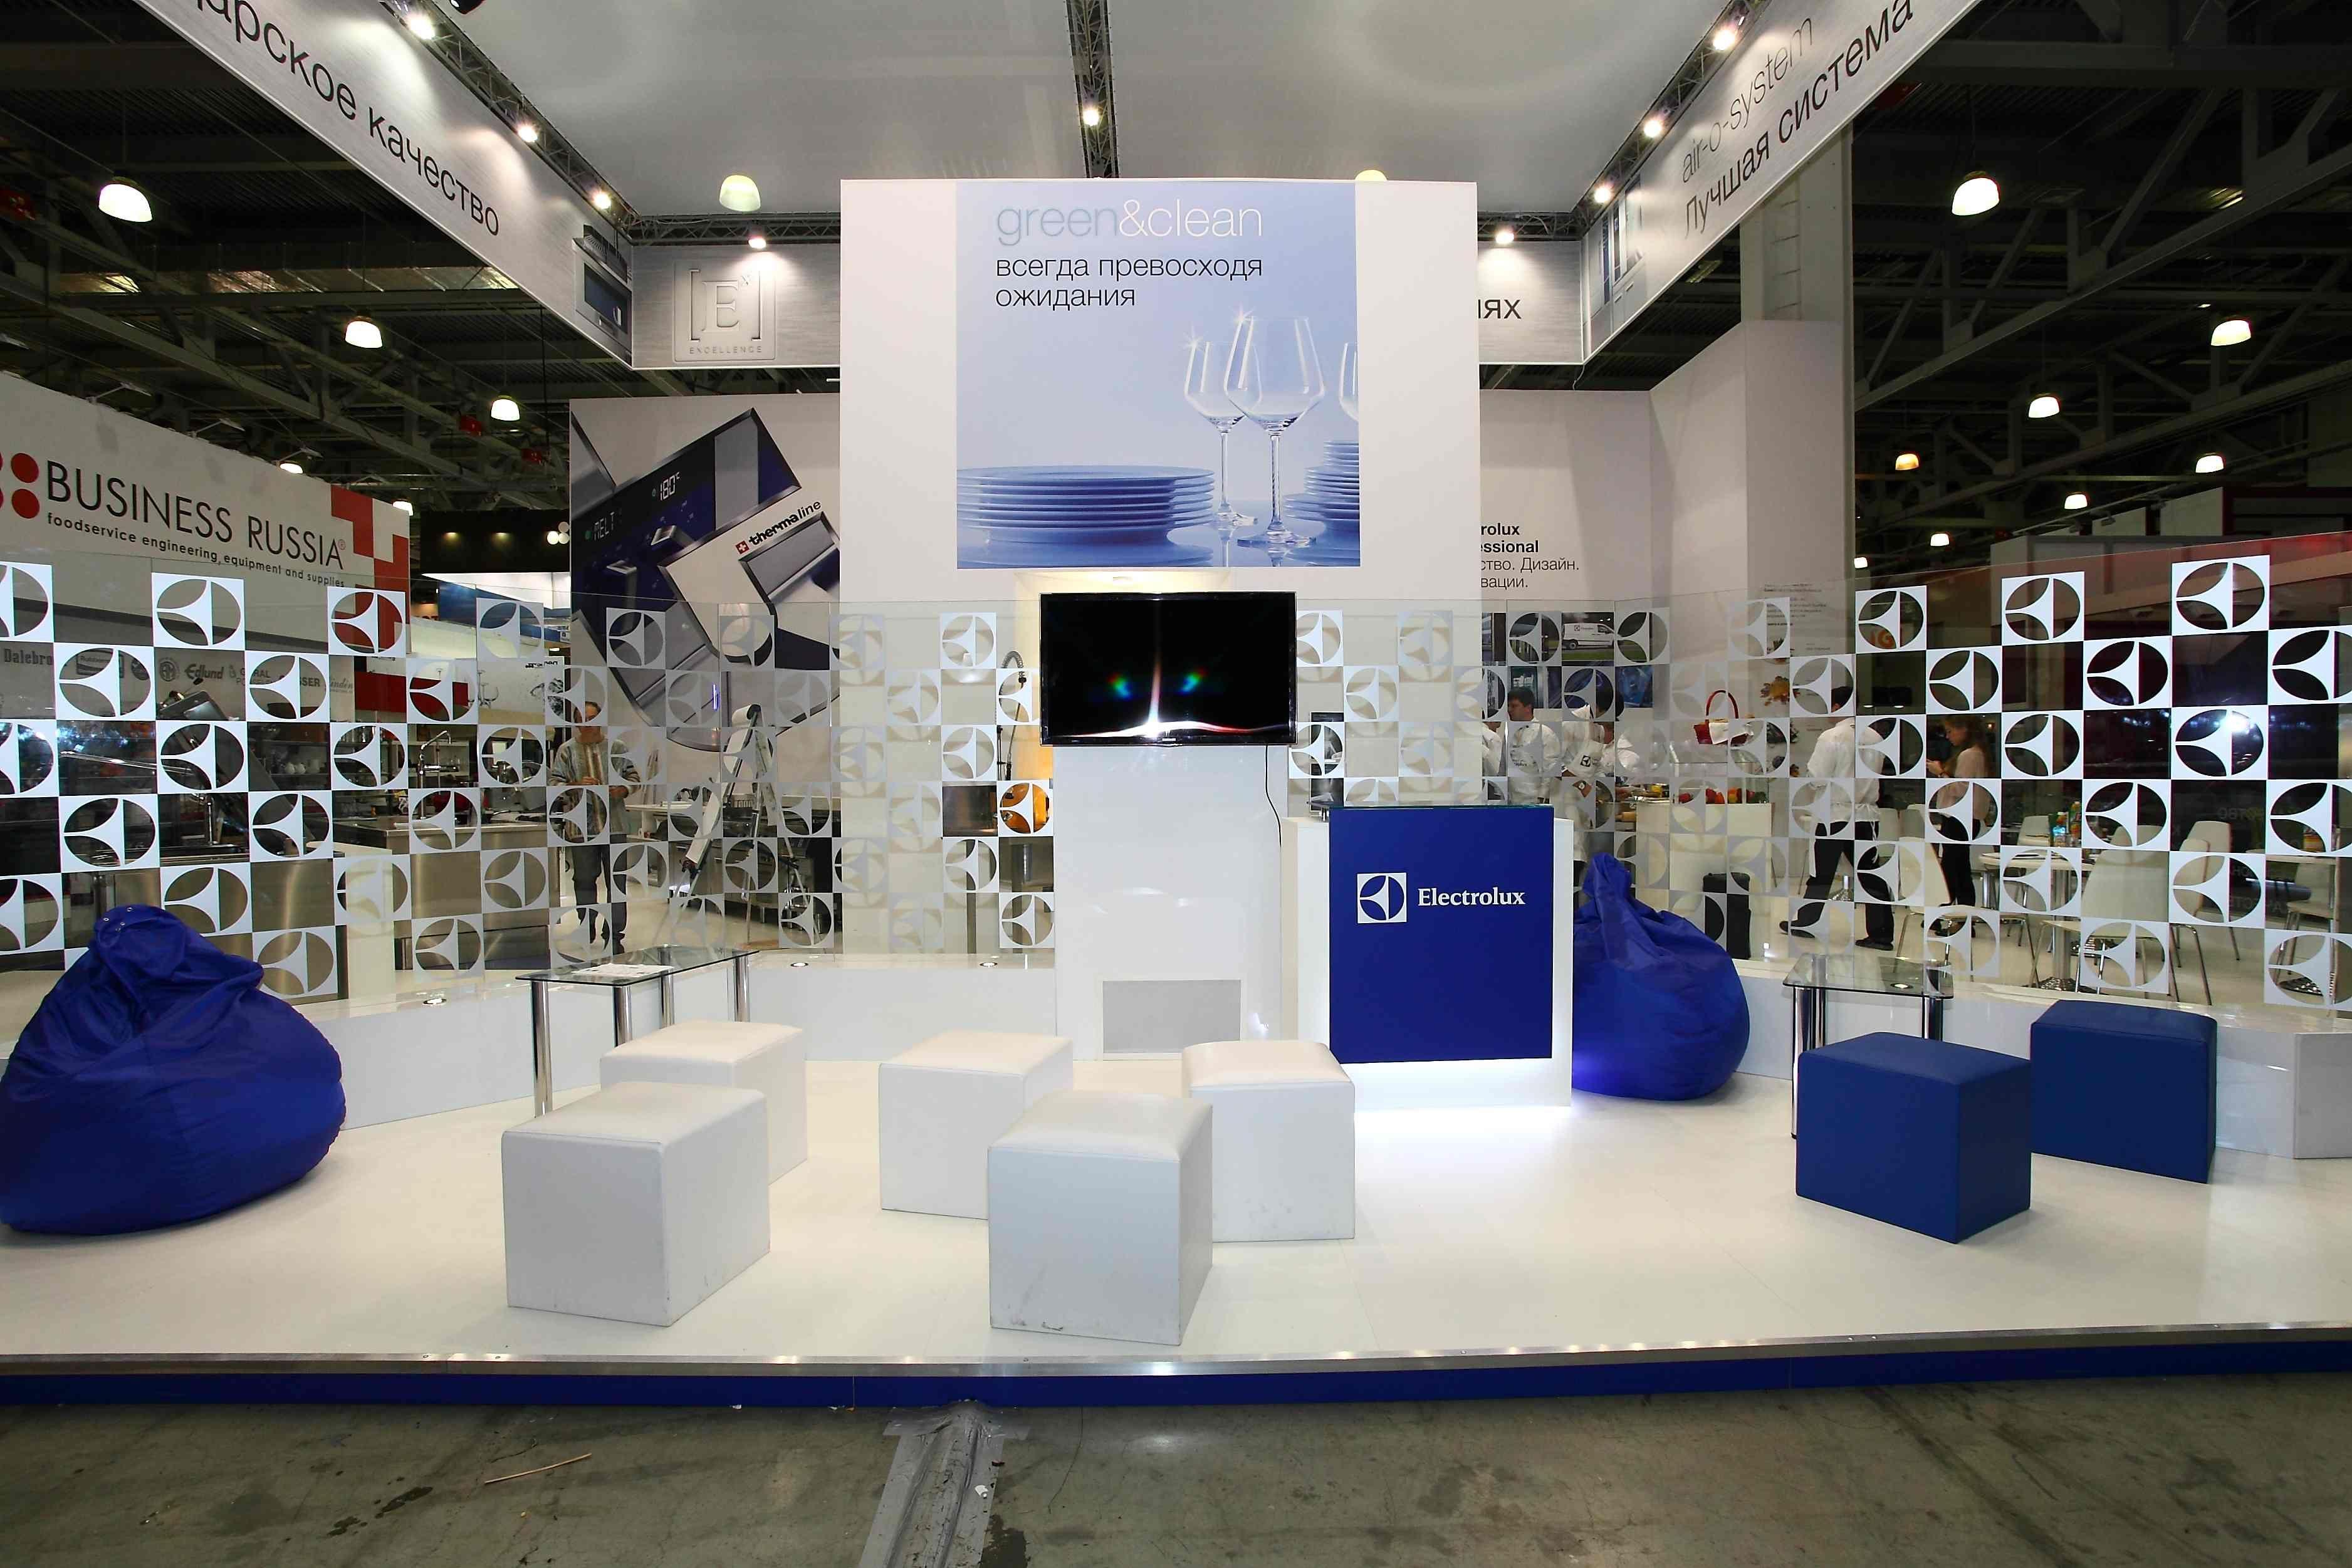 Expo Stand Bolivia : Dart expo llc